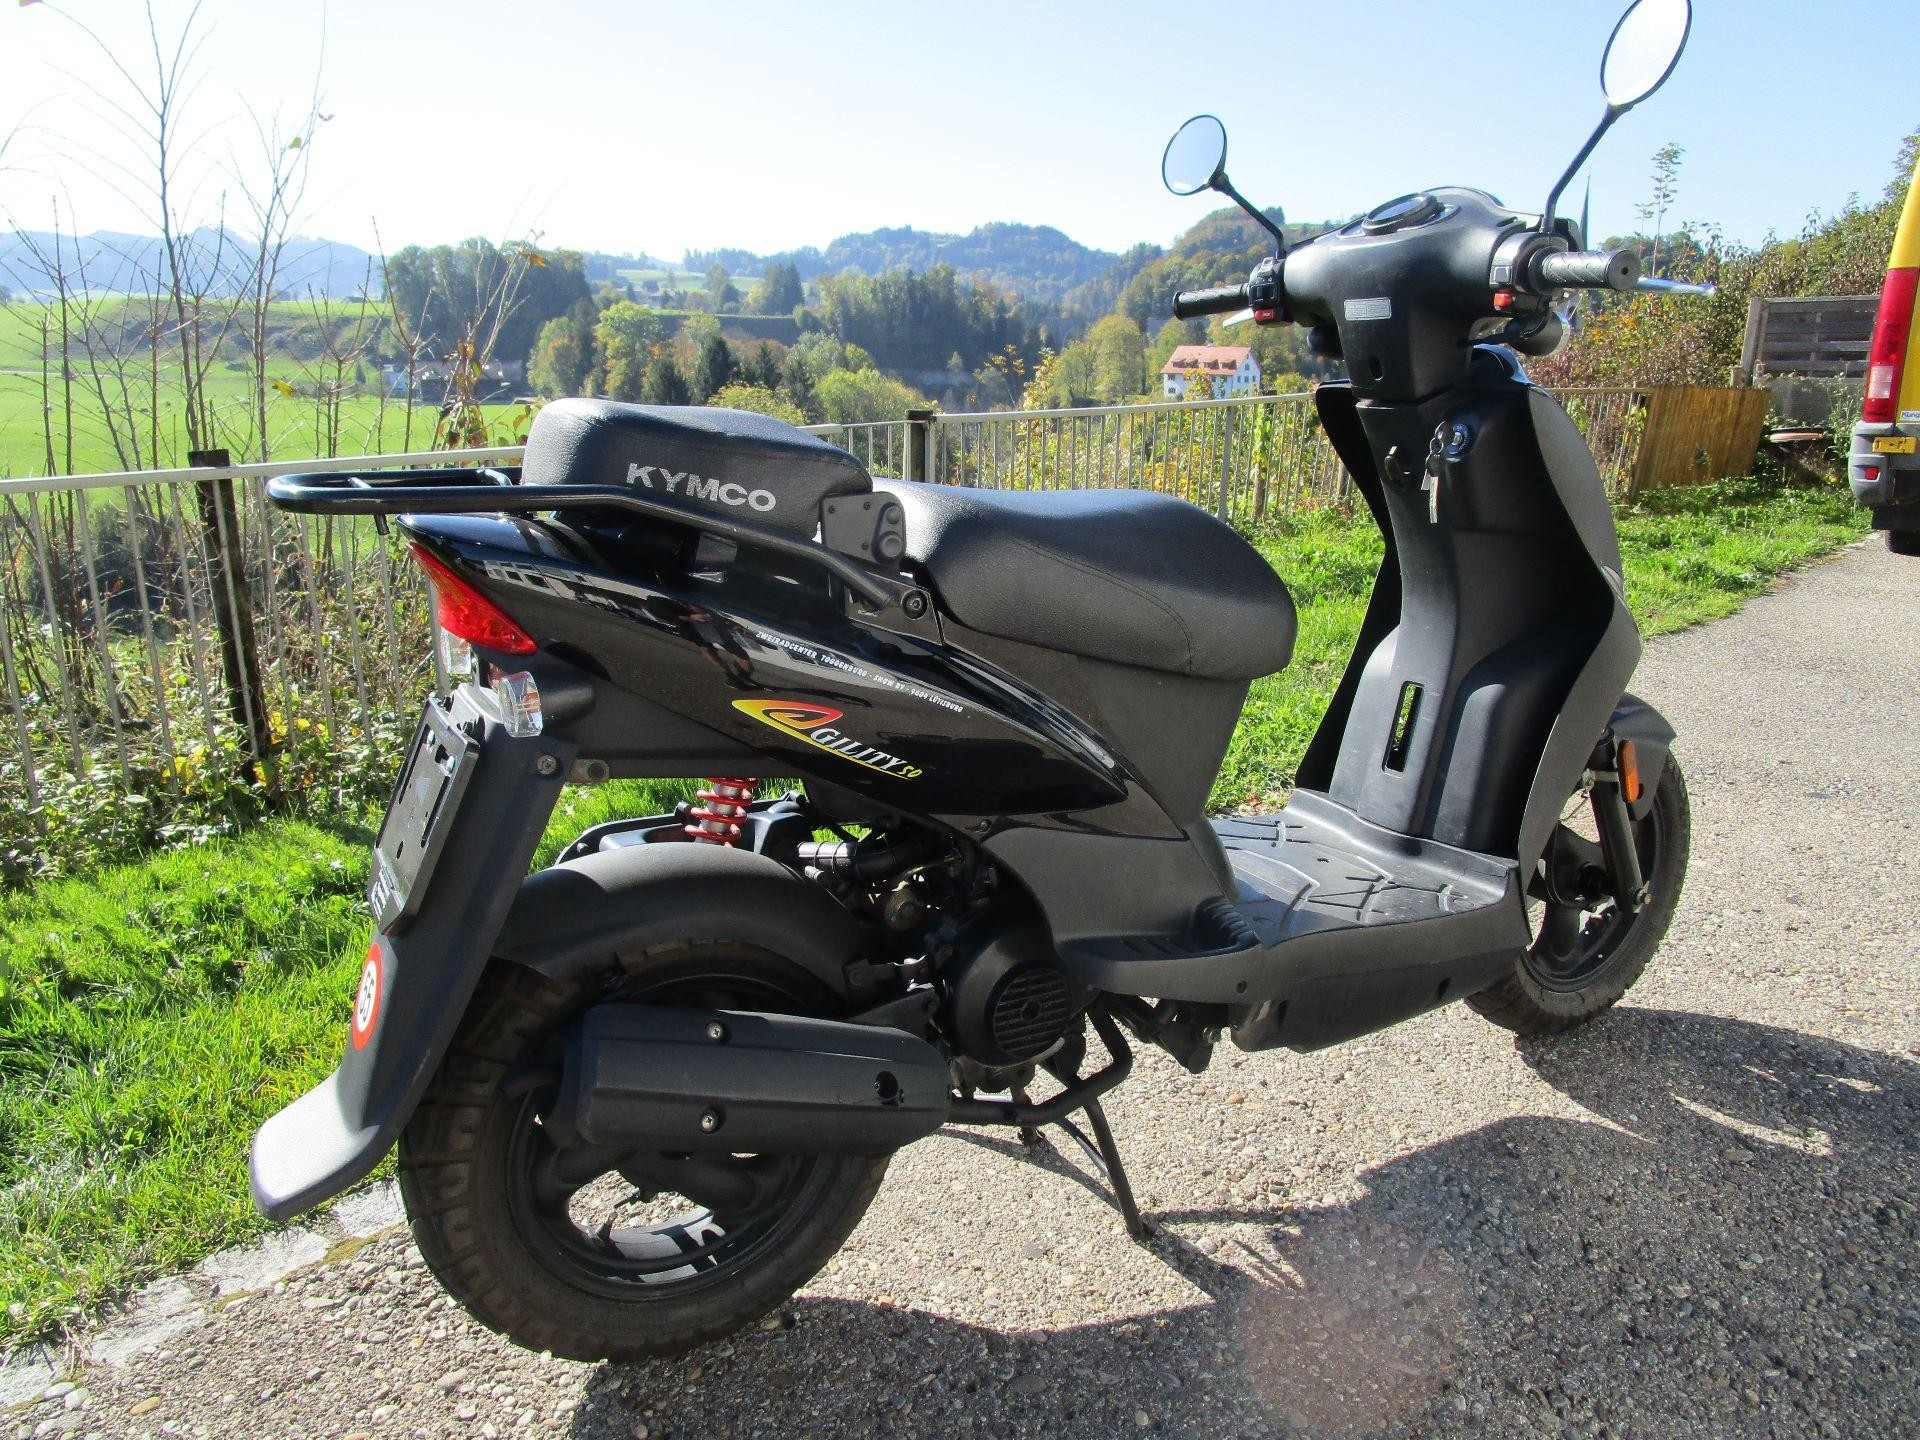 motorrad occasion kaufen kymco agility 50 zweiradcenter toggenburg l tisburg. Black Bedroom Furniture Sets. Home Design Ideas